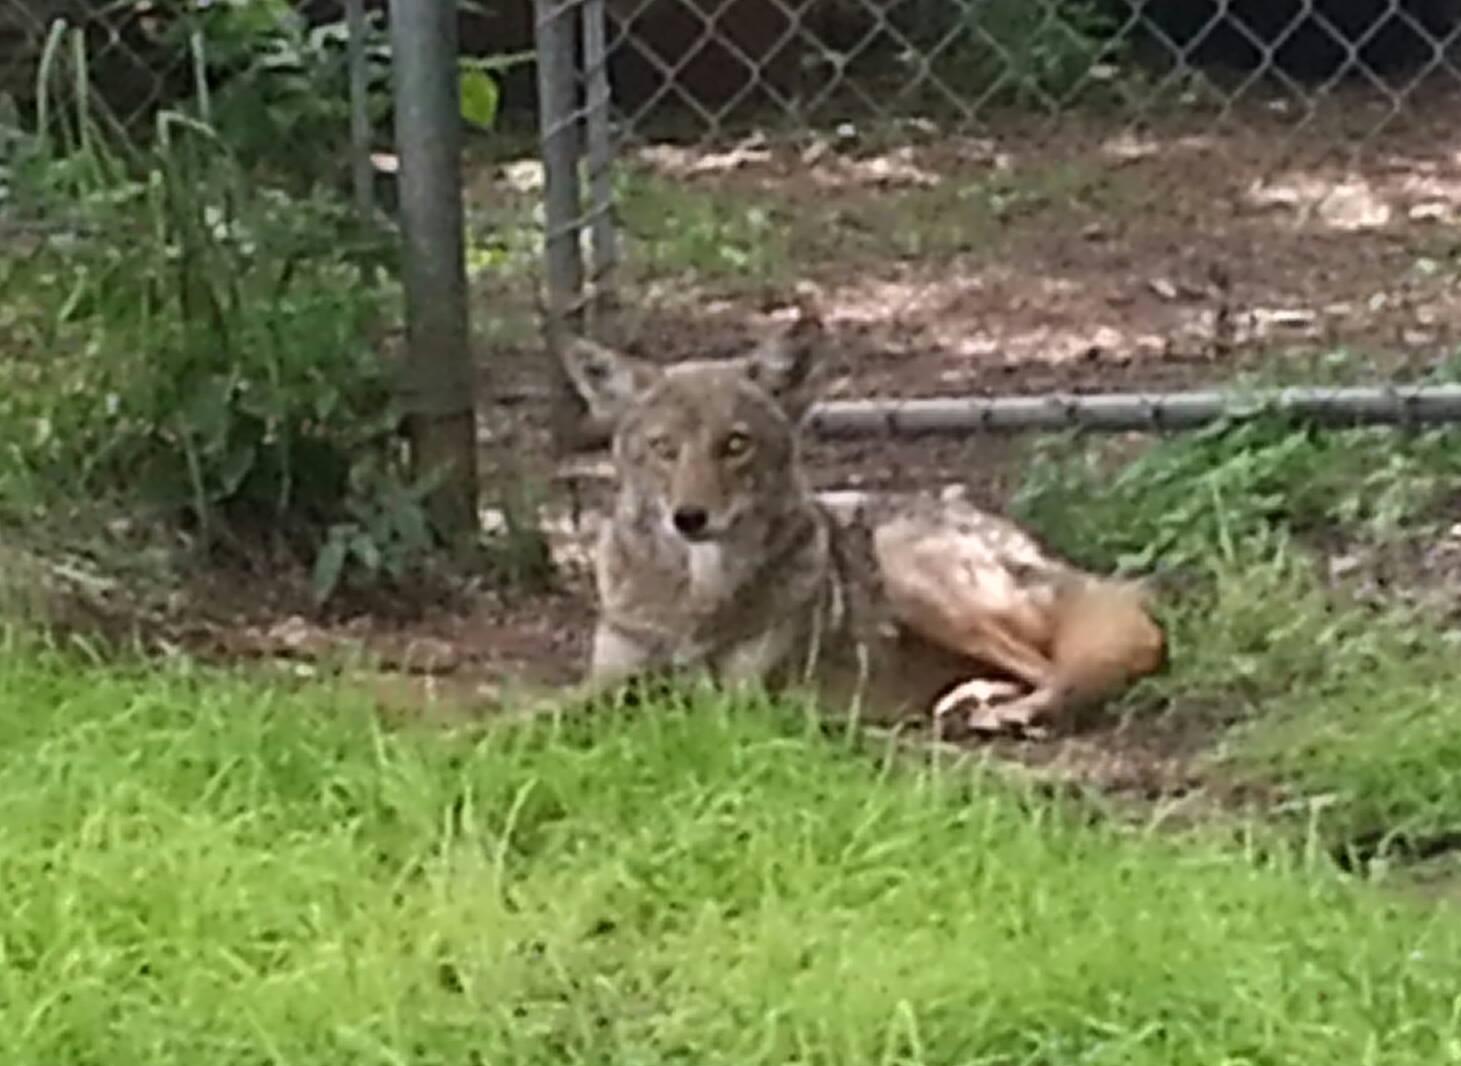 Coyote In Yard